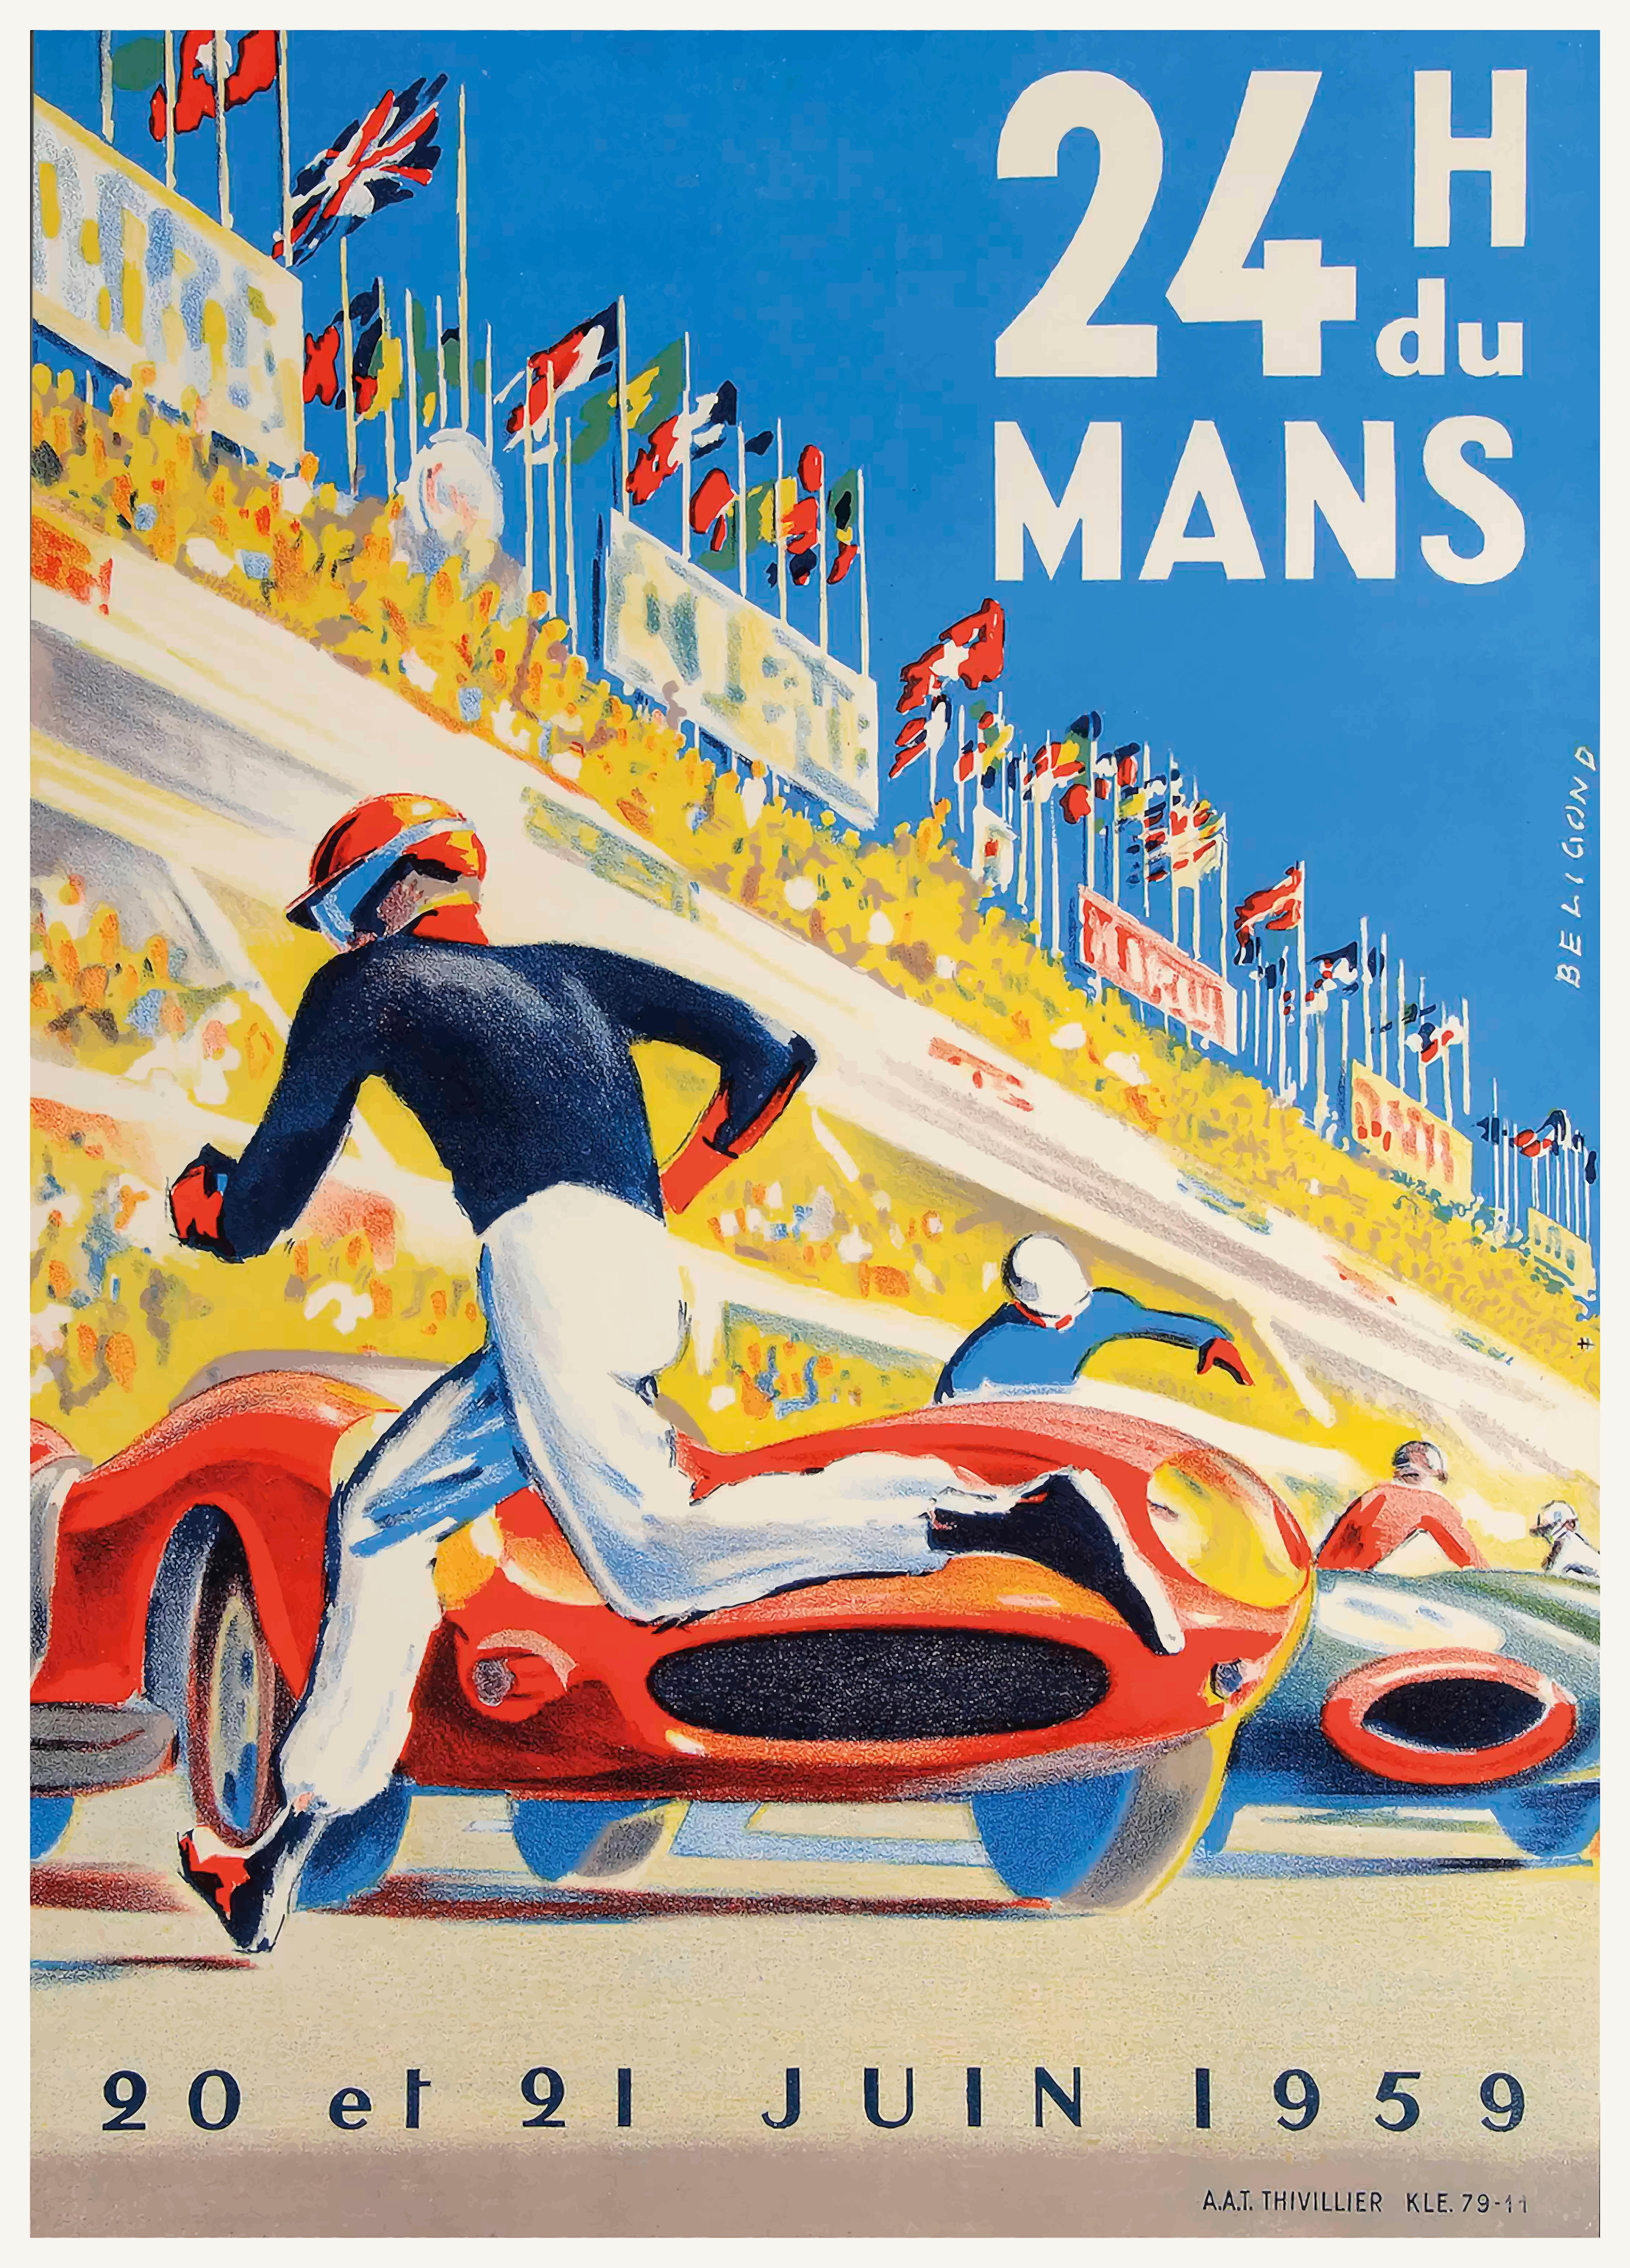 1923 24 Hours Le Mans French Automobile Race Vintage Travel Poster Print